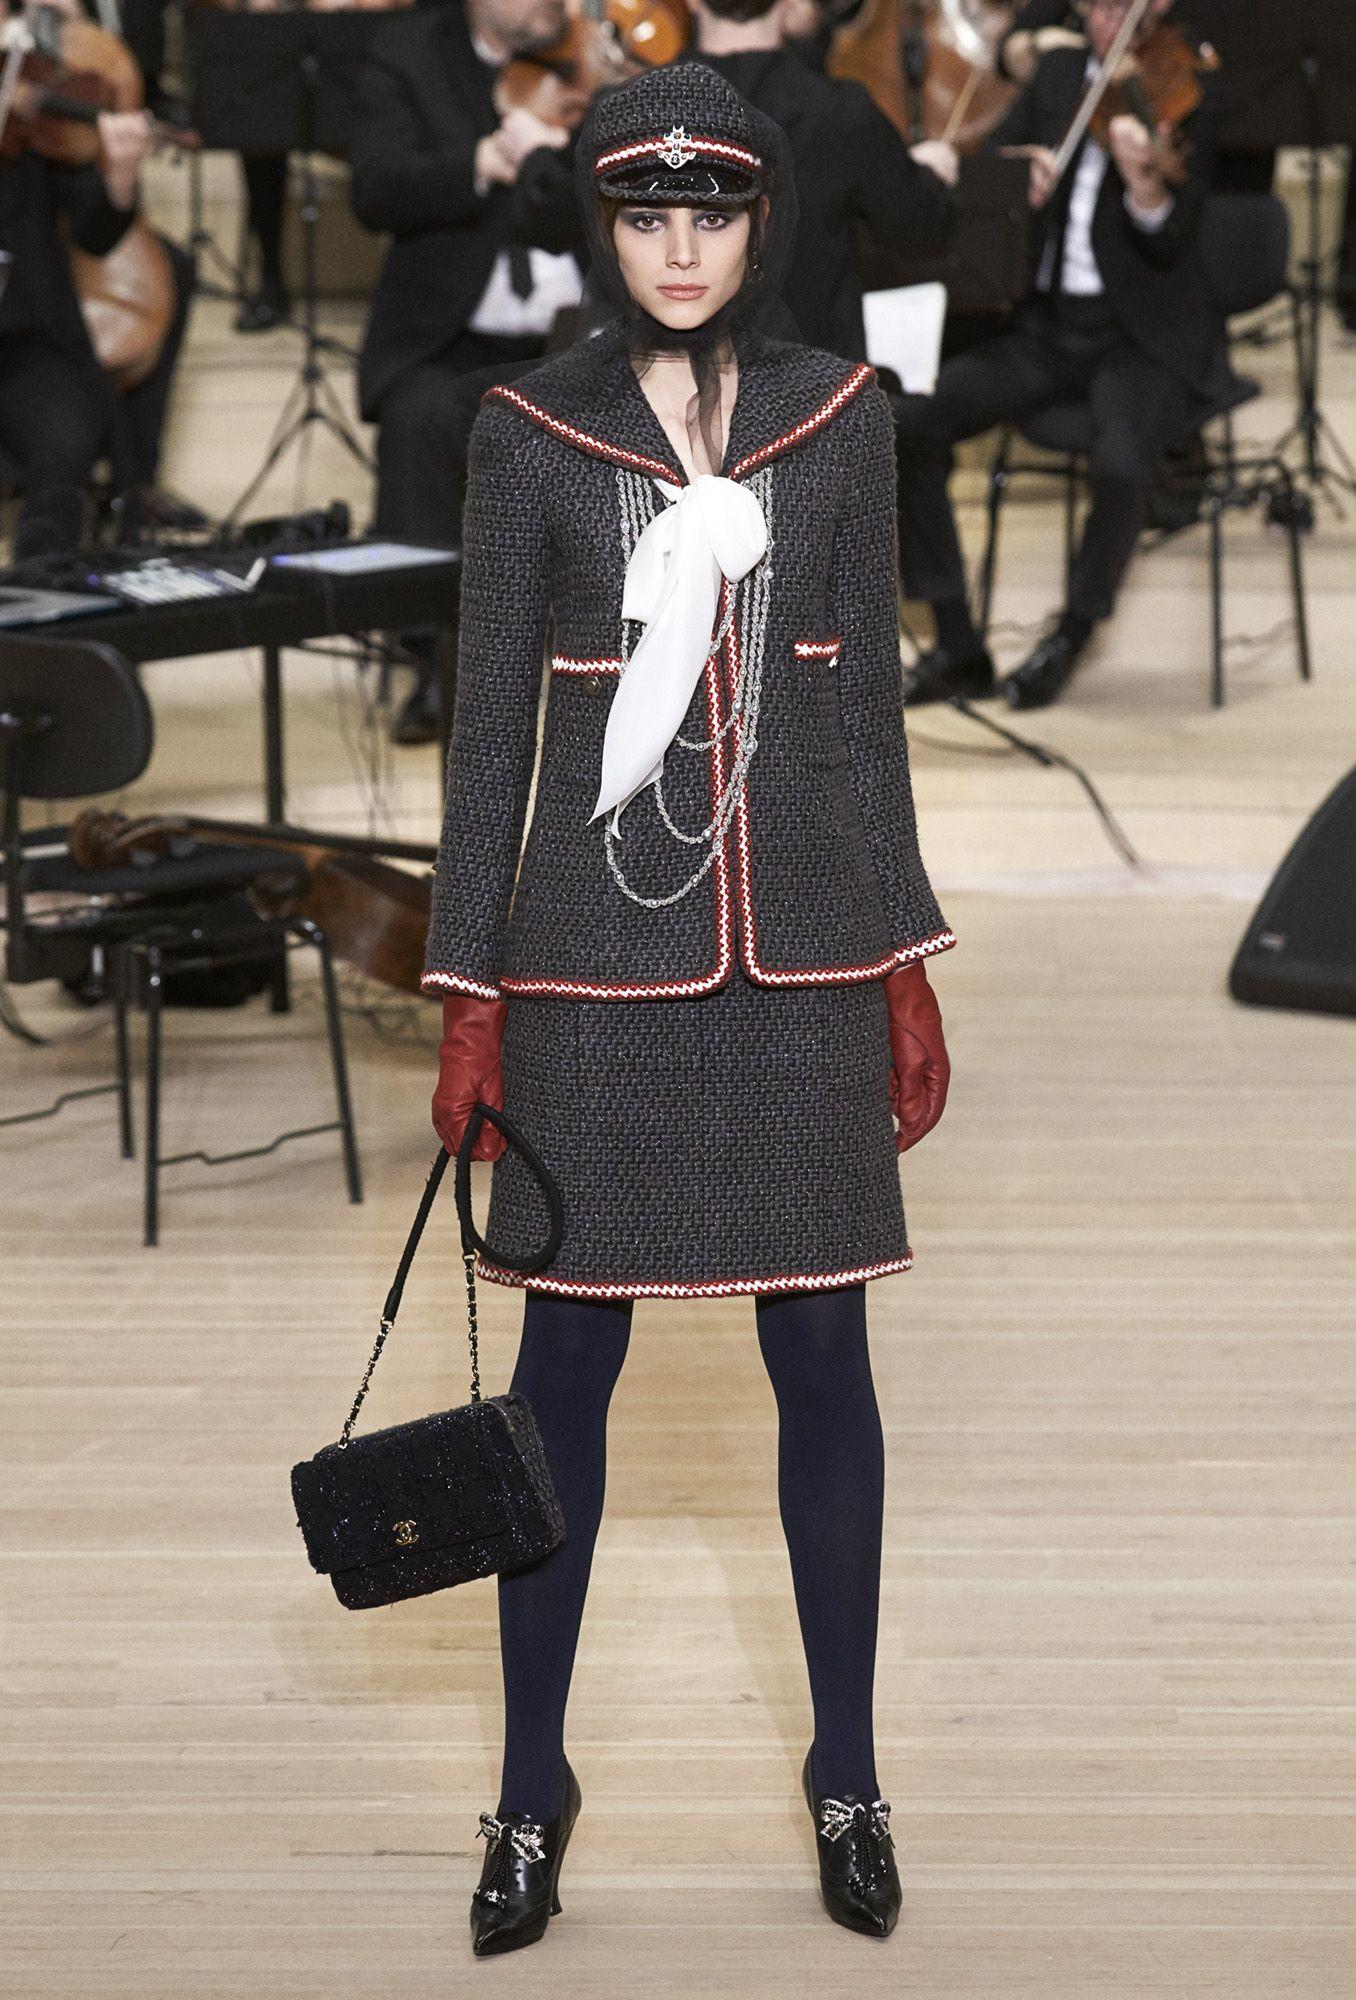 Sailor-collared tweed suit